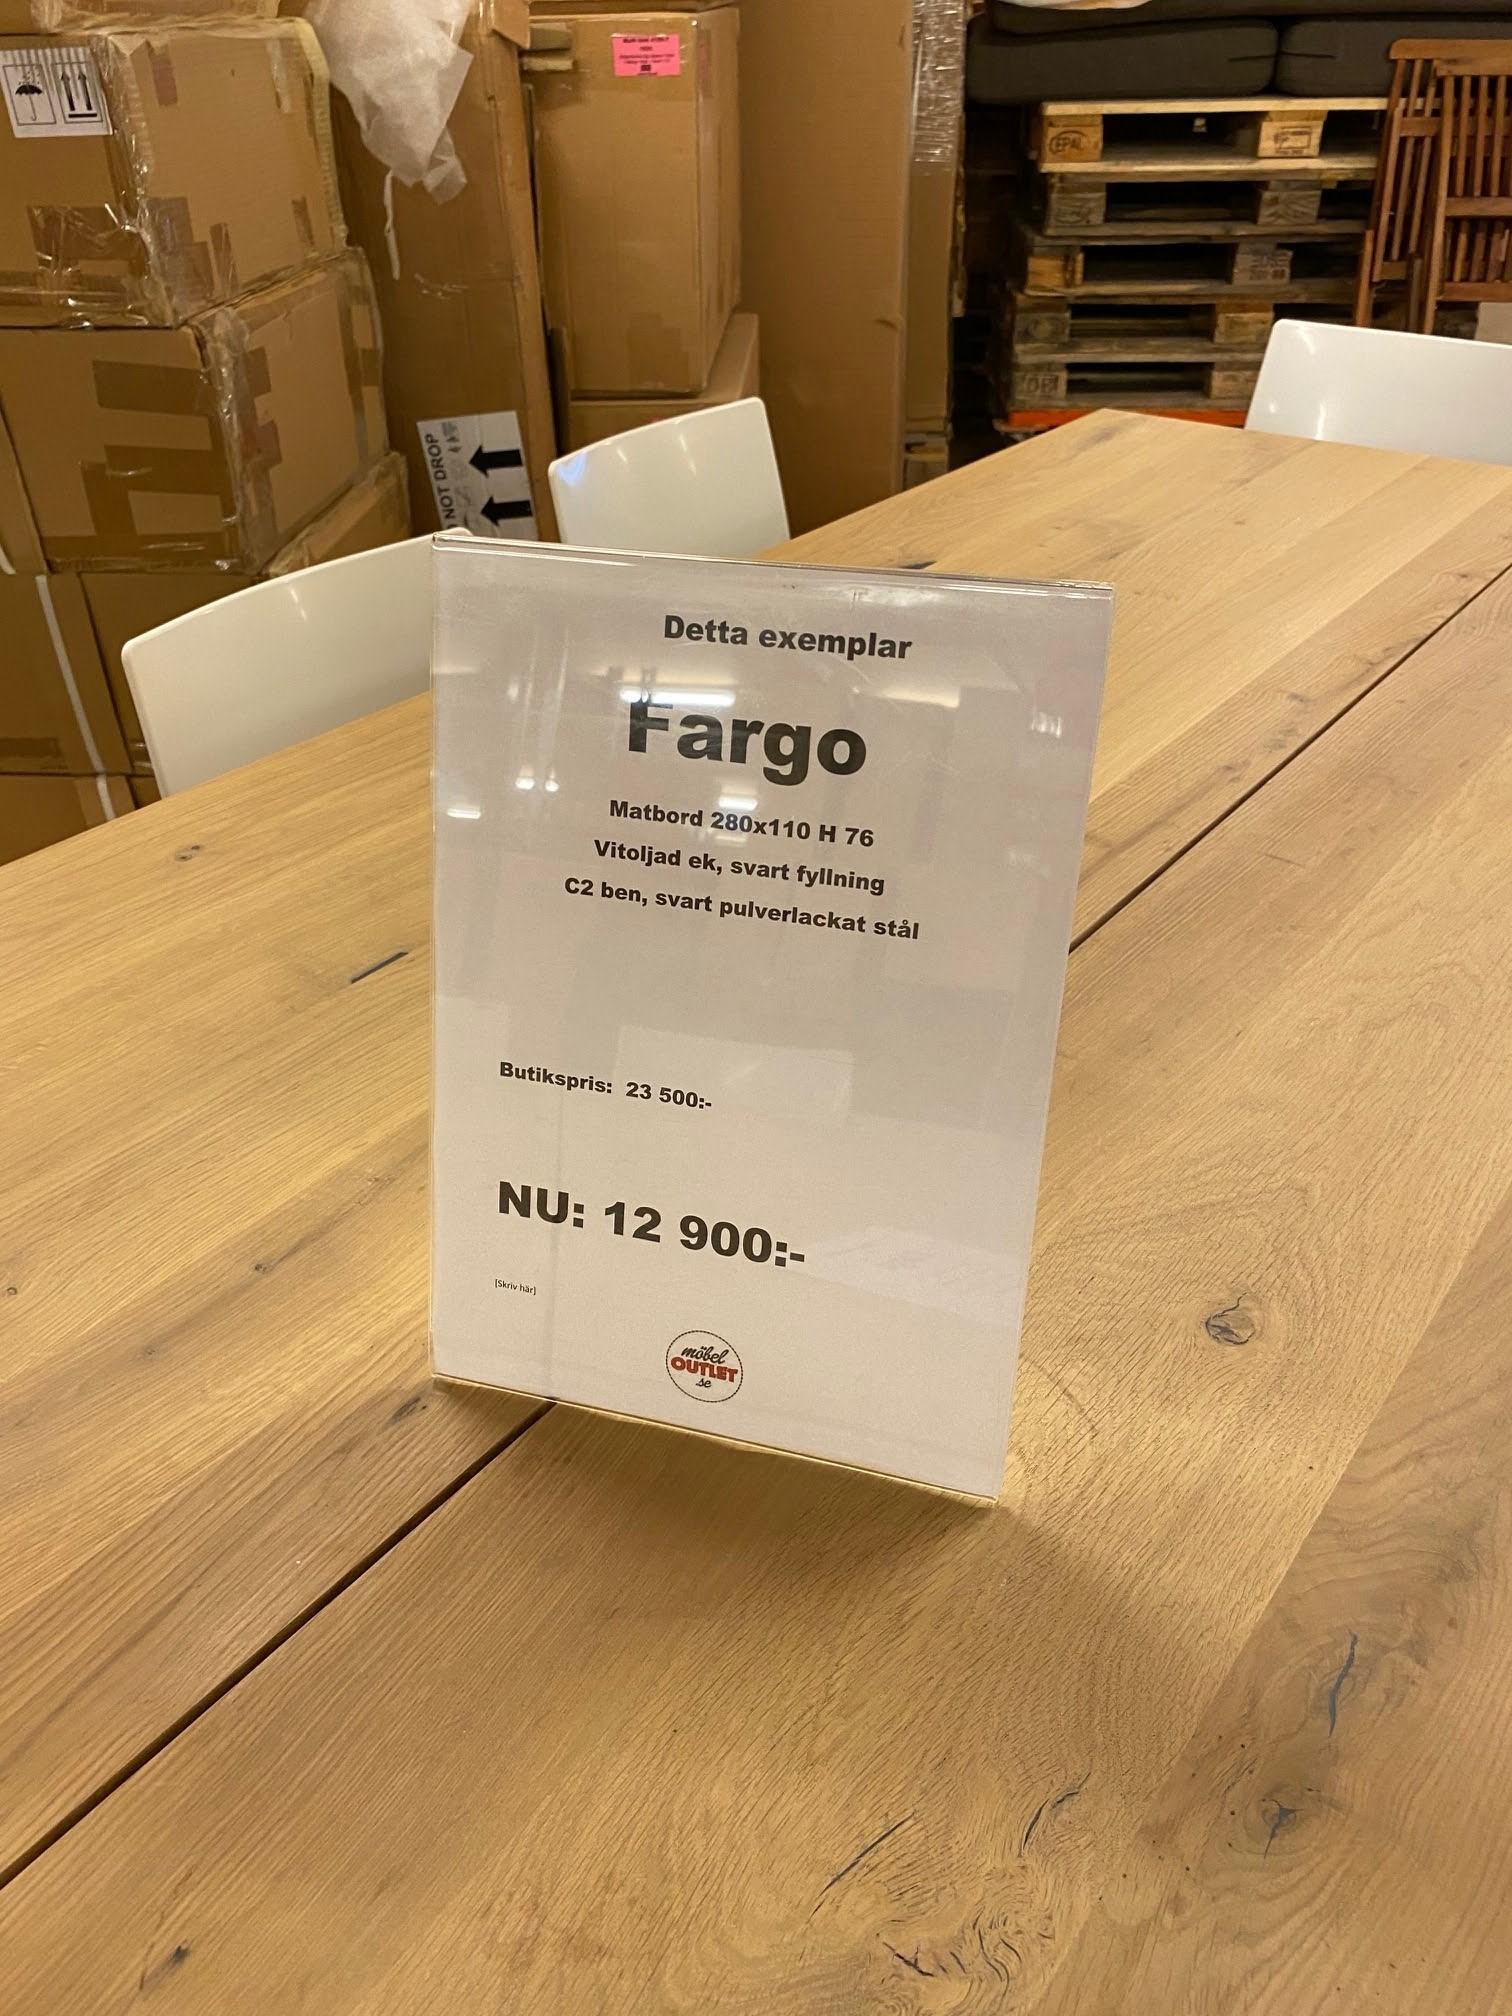 Fargo Matbord 280x110